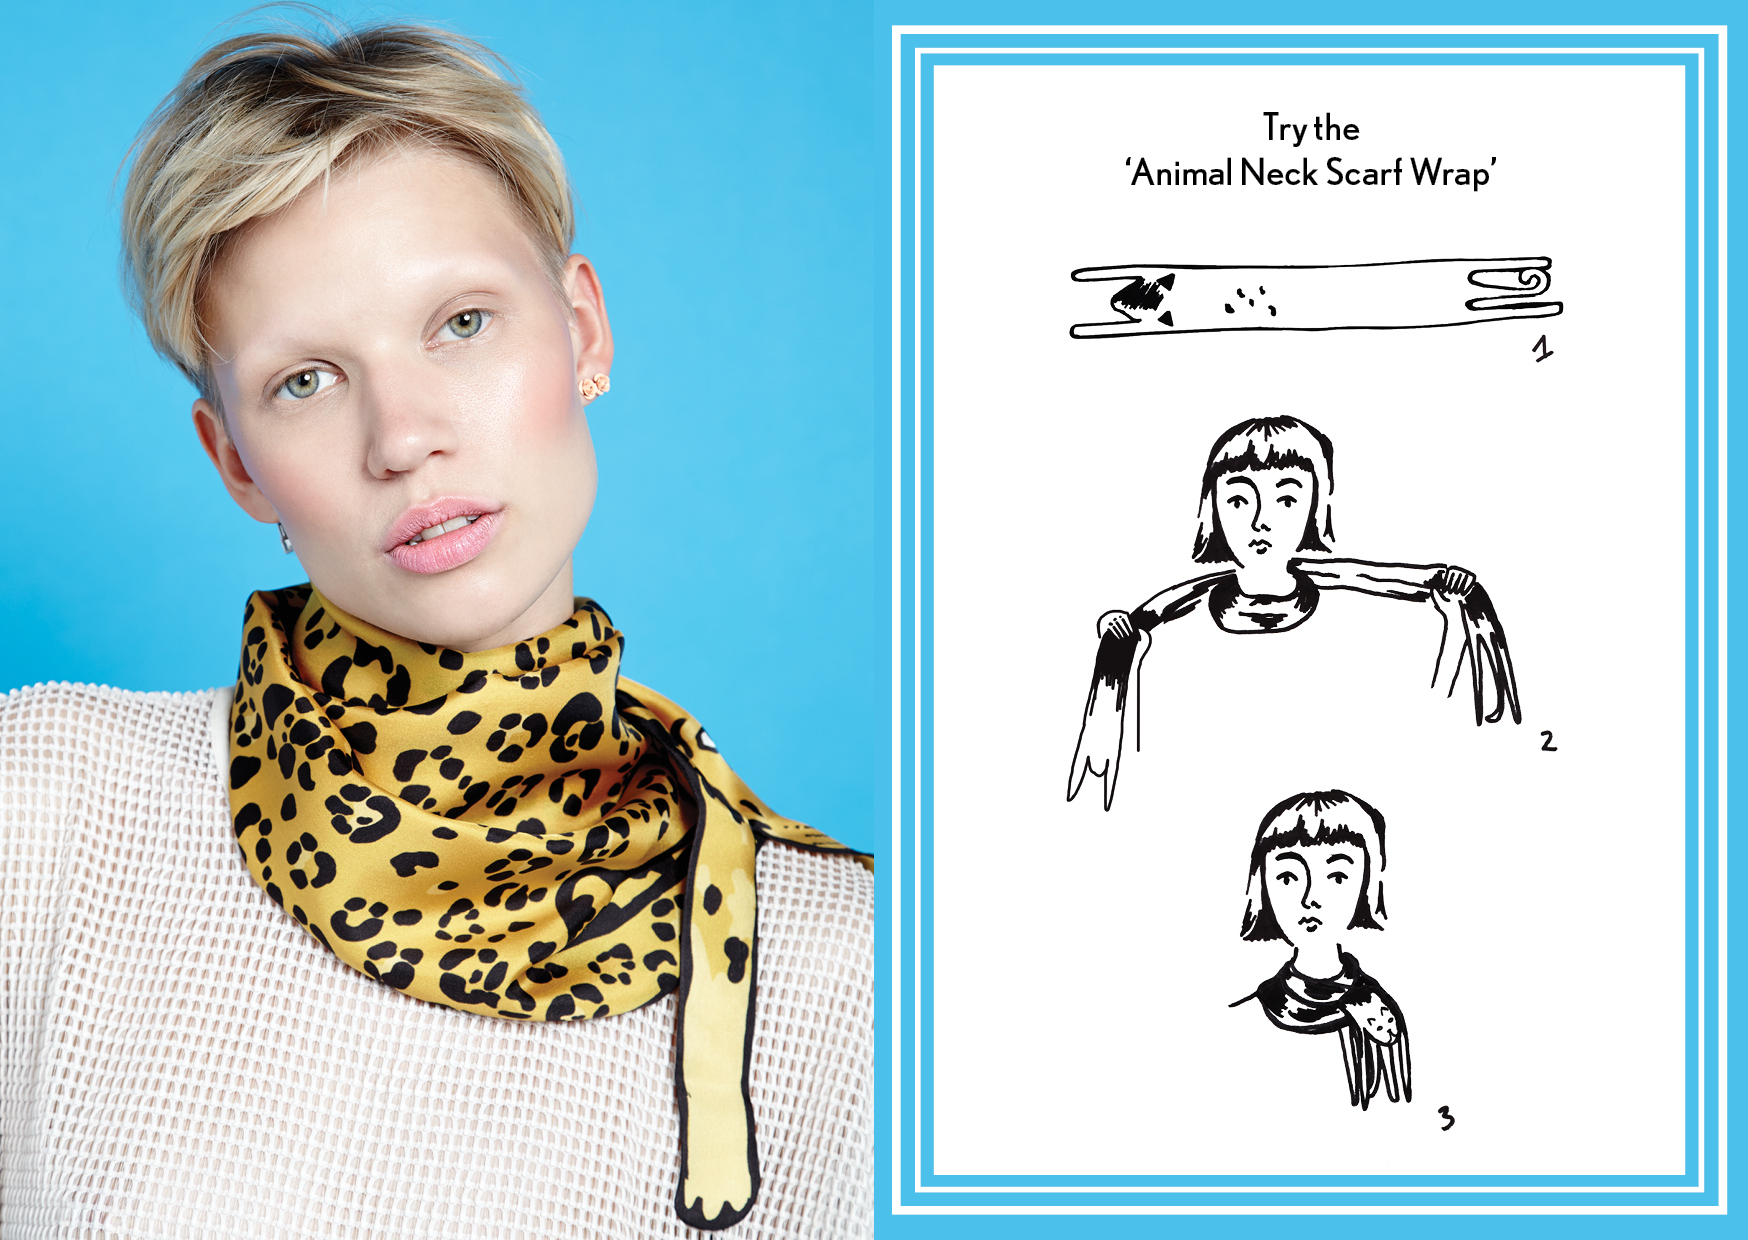 Animal Neck Scarf Wrap Gold Jaguar - how to style a silk scarf - Animal Long Silk Scarf.jpg